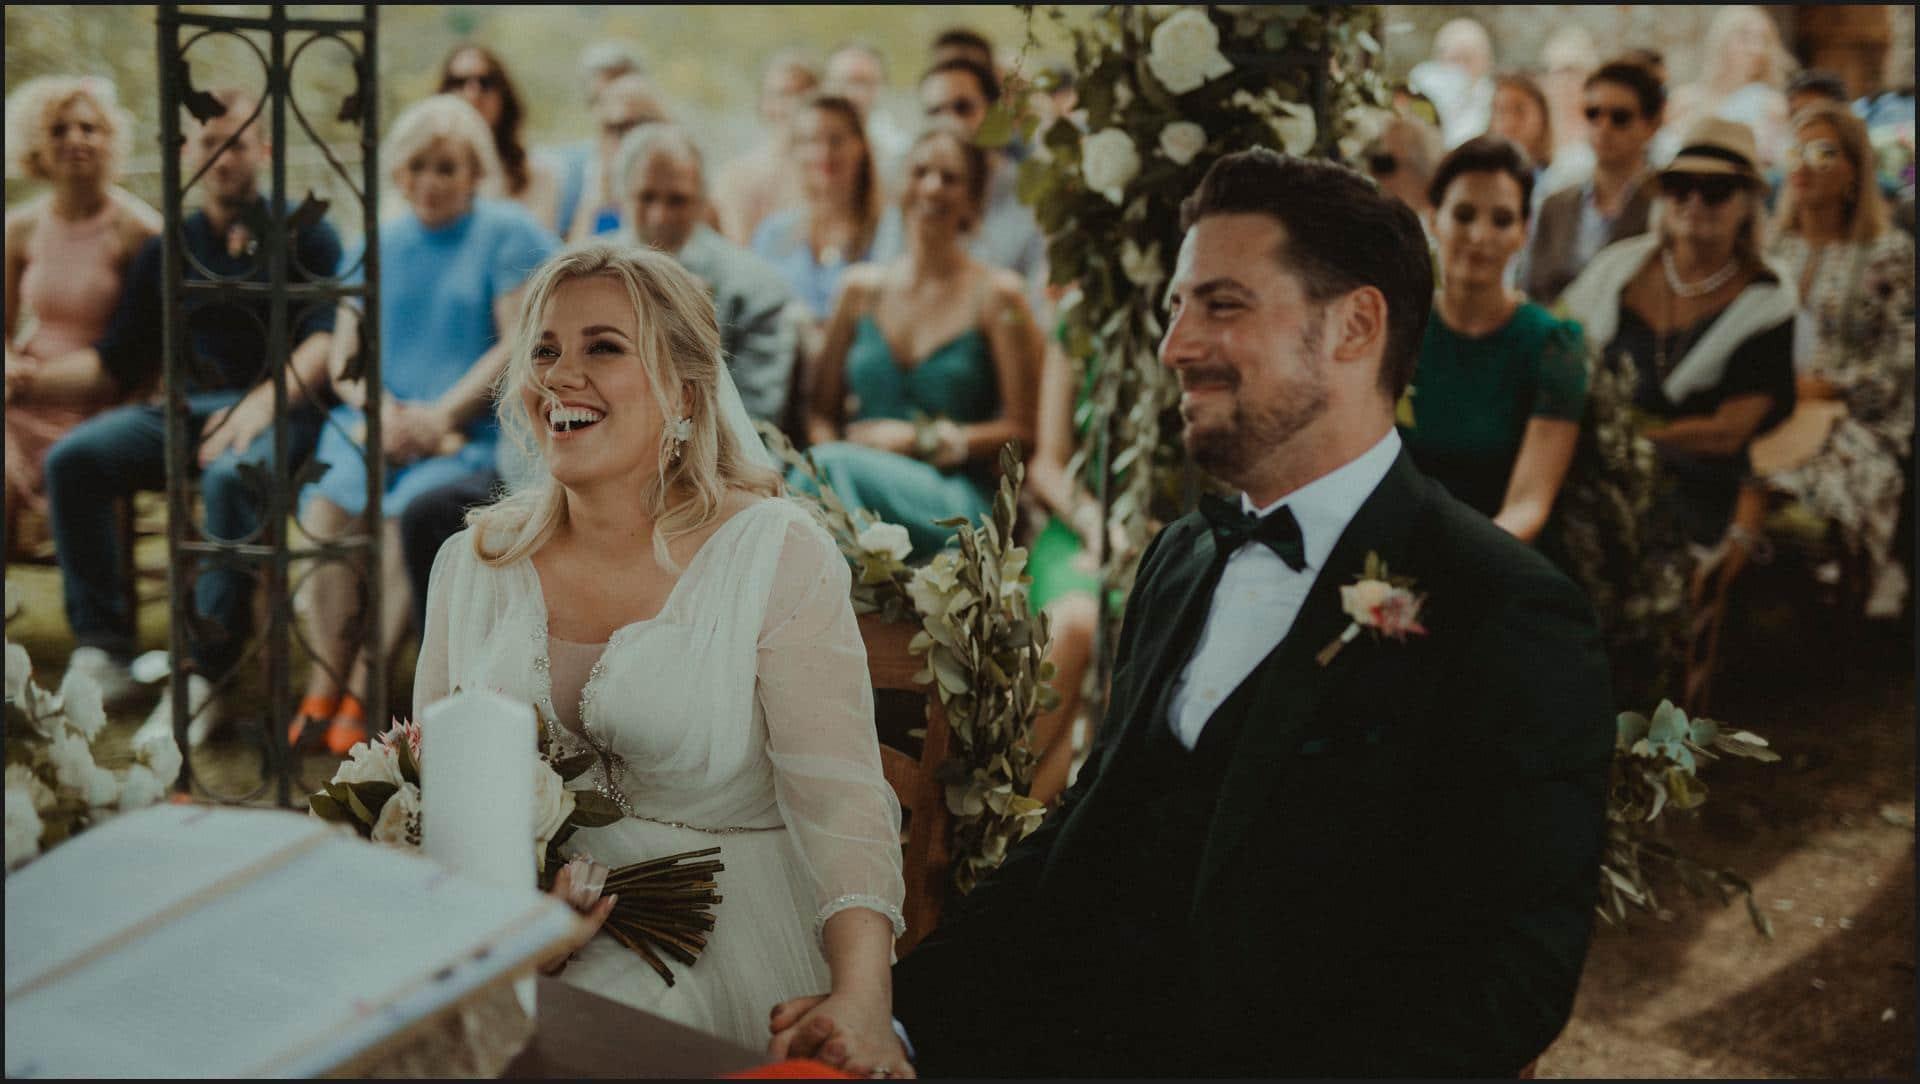 borgo di tragliata, wedding, rome, wedding in rome, ceremony, wedding in italy, destination wedding